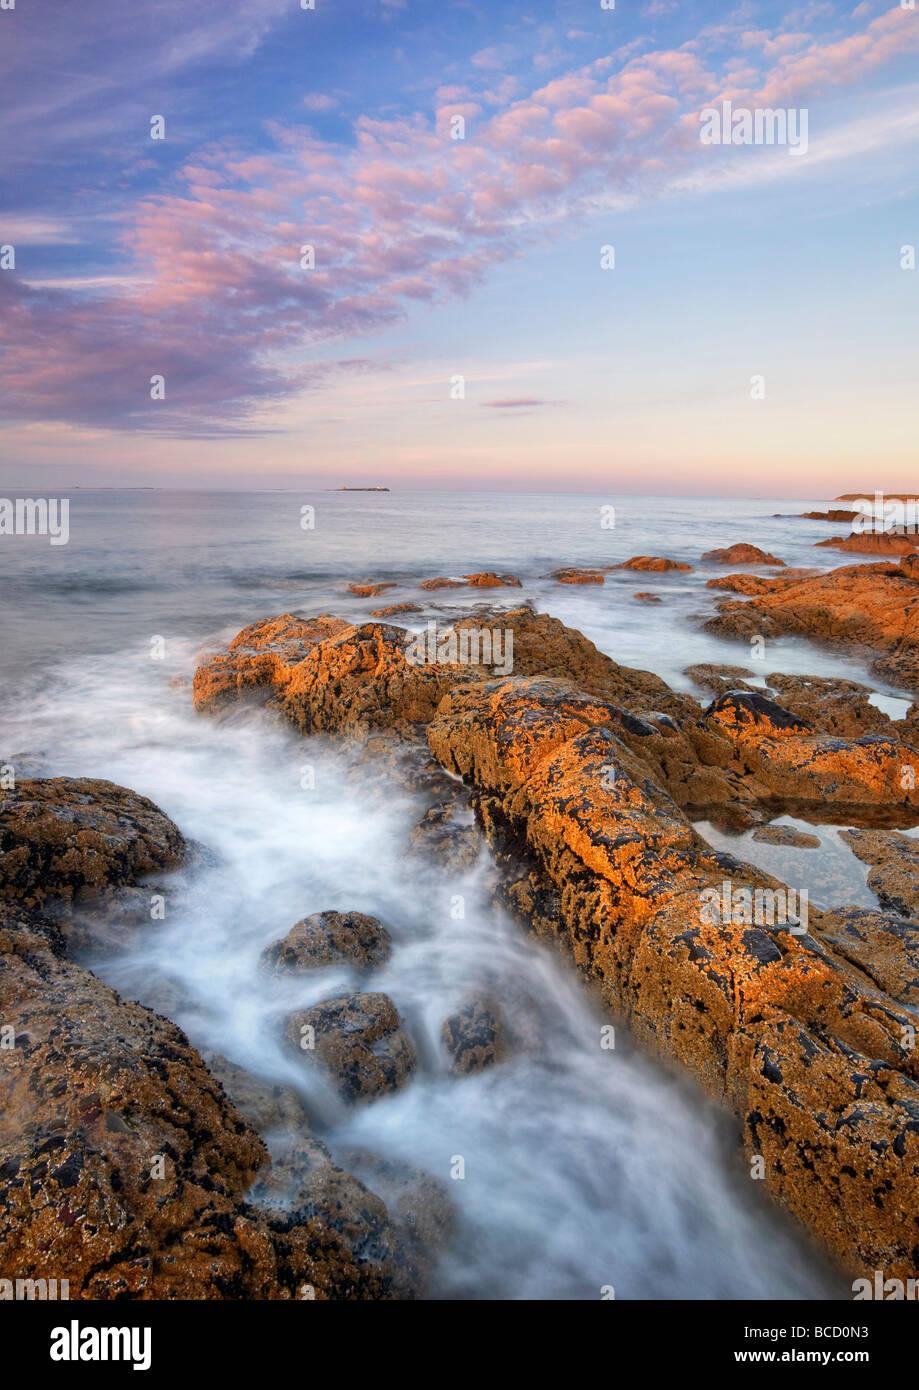 Côte Rocheuse avec iles Farne sur l'horizon. Lunteren. Le Northumberland. L'Angleterre Photo Stock